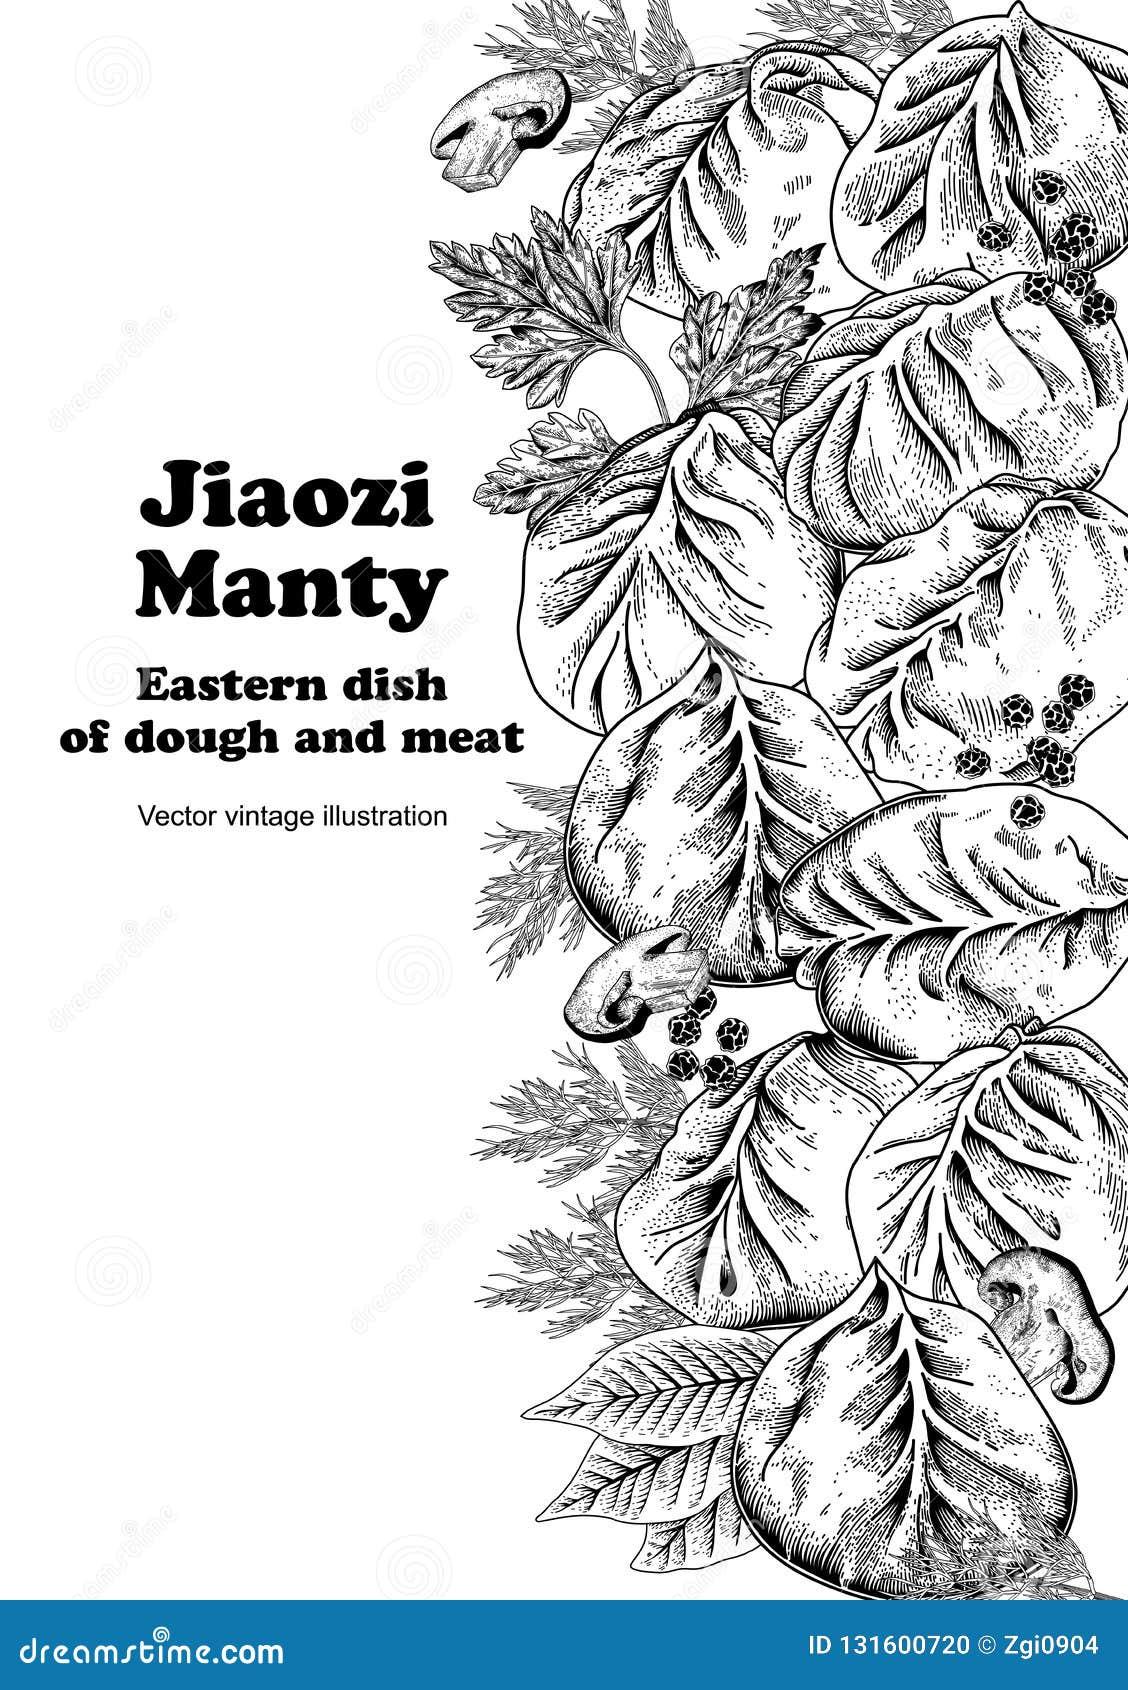 Jiaozi. Manty. Meat dumplings. National dishes.